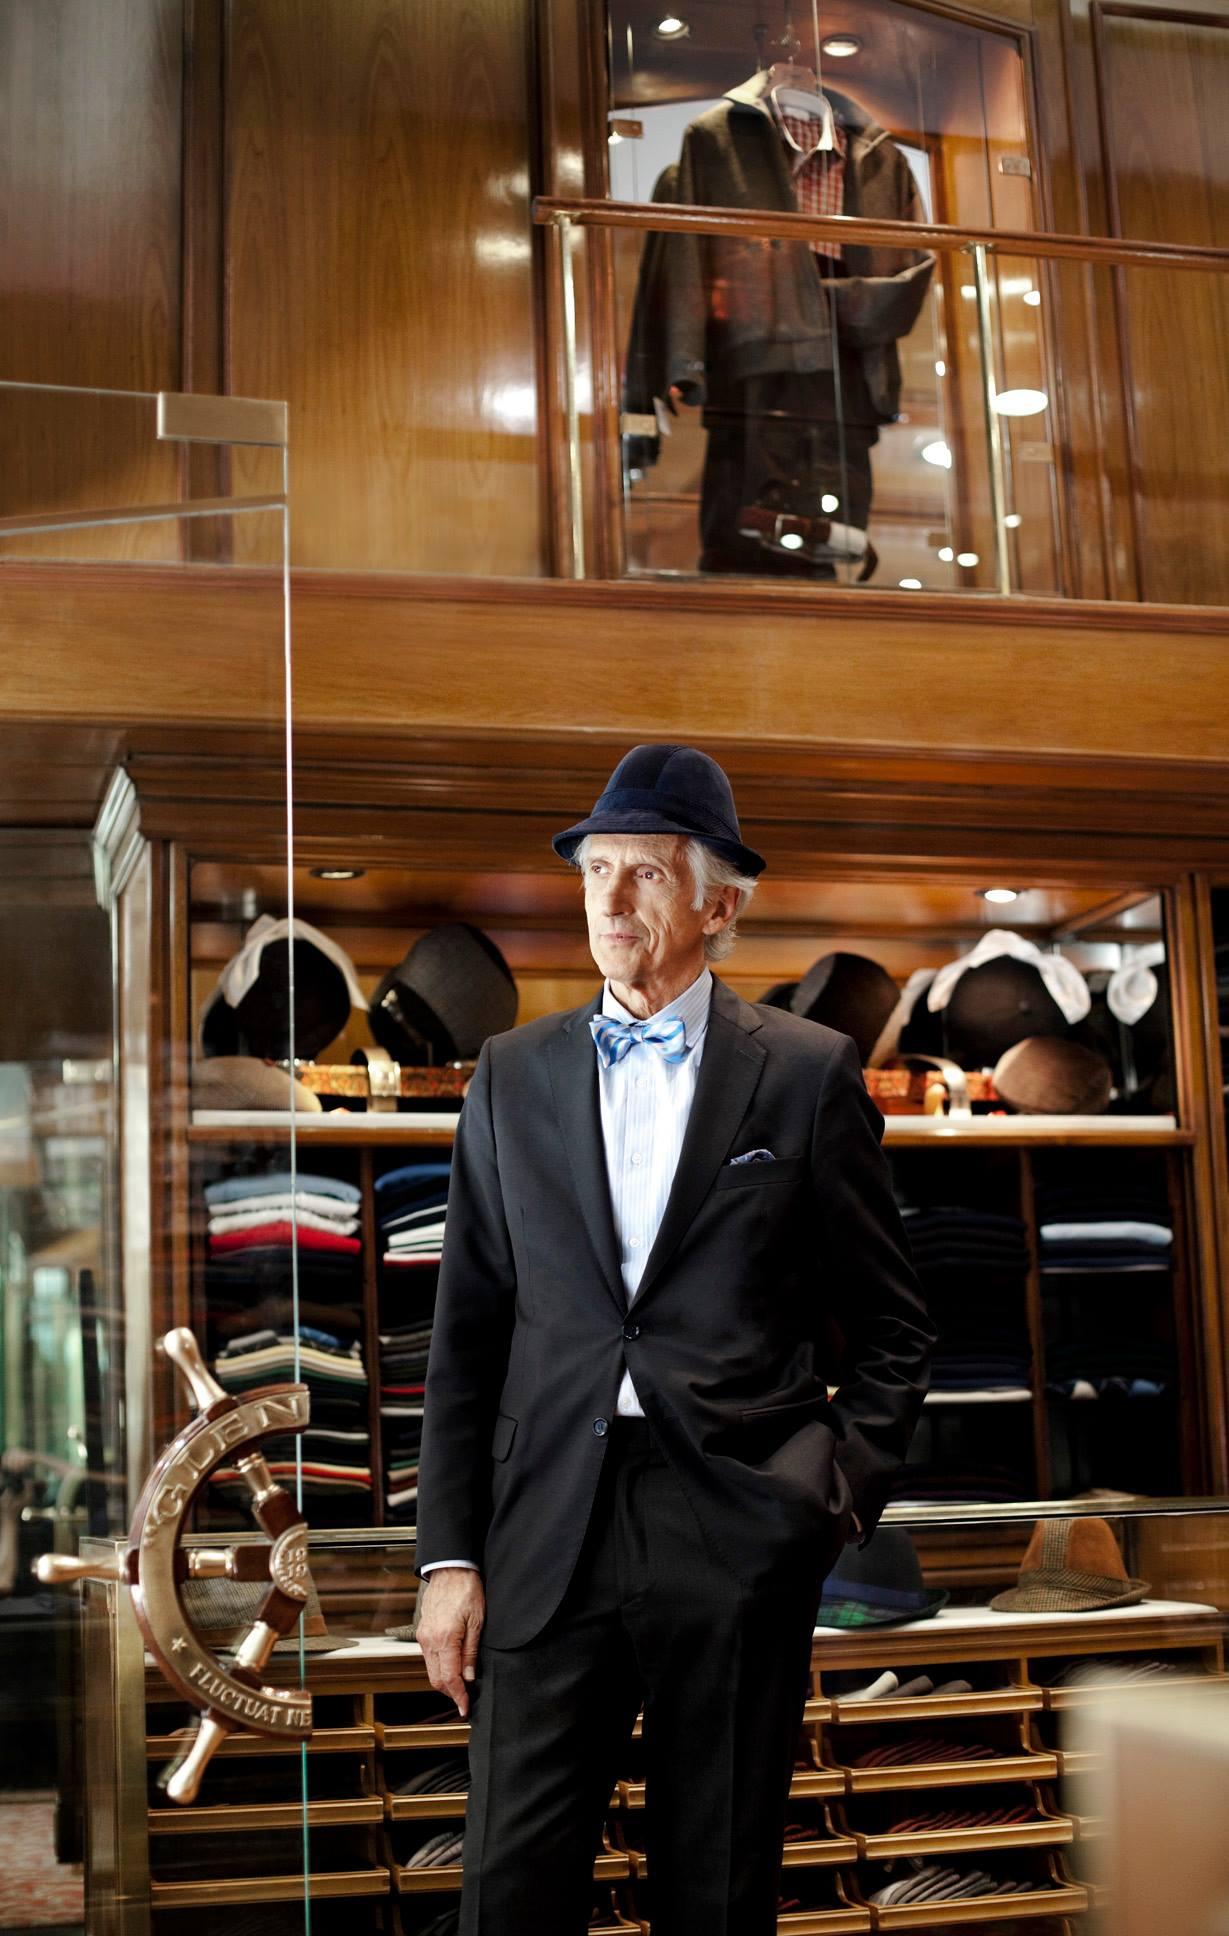 Tienda Gienmore, ropa de caballero. Foto